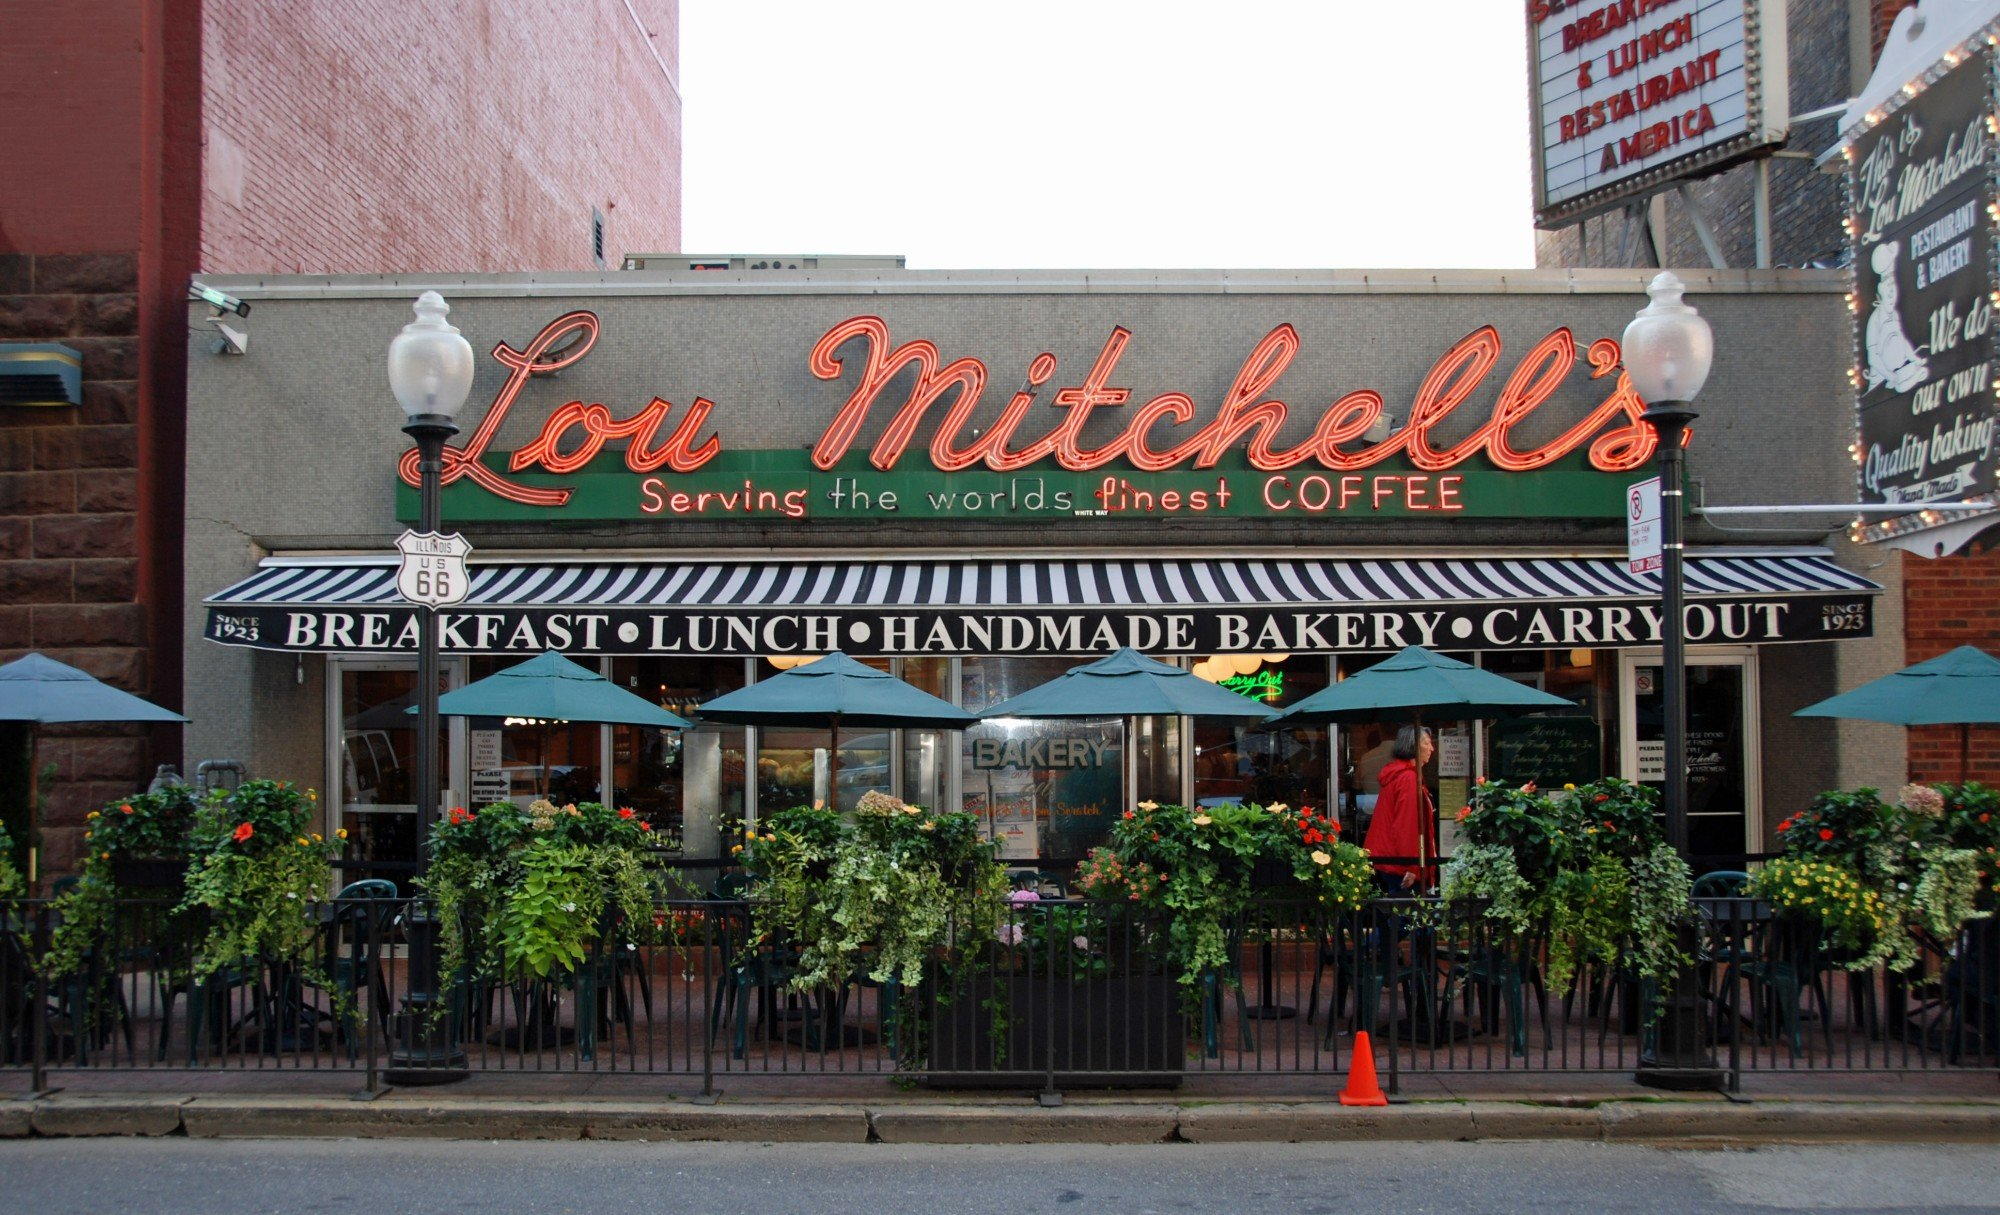 Lou Mitchell's Restaurant in Chicago, built in 1949.